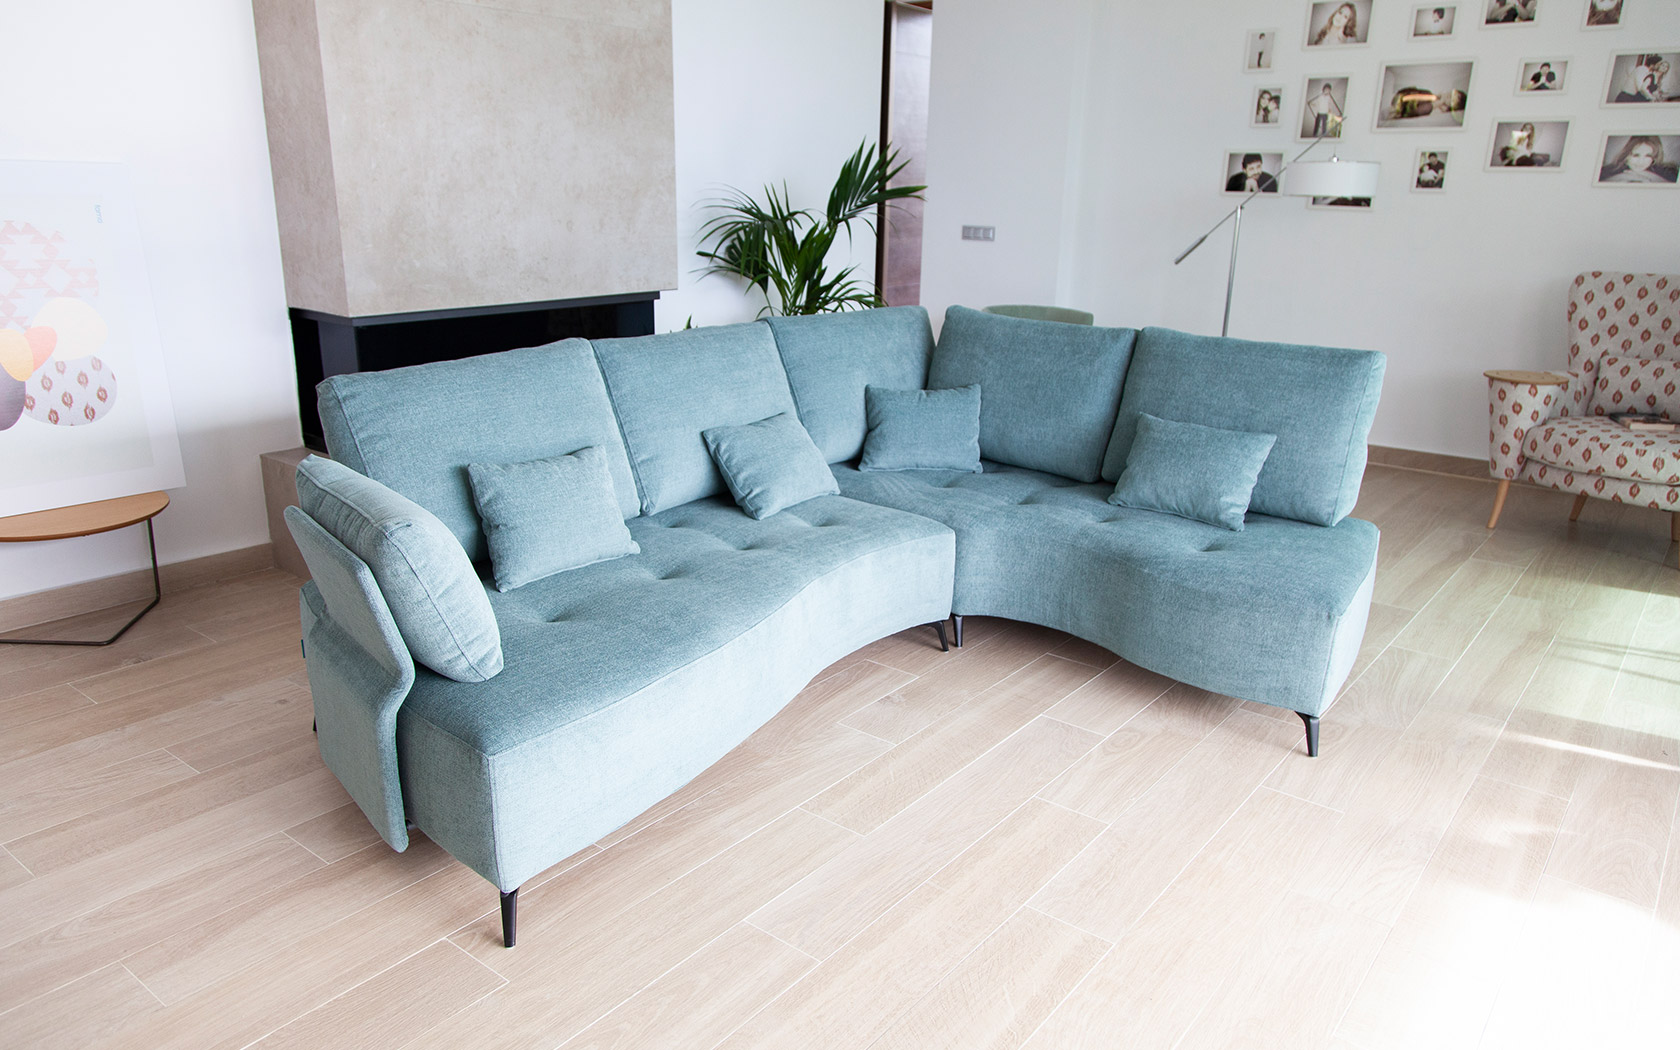 kalahari sofa 2021 12